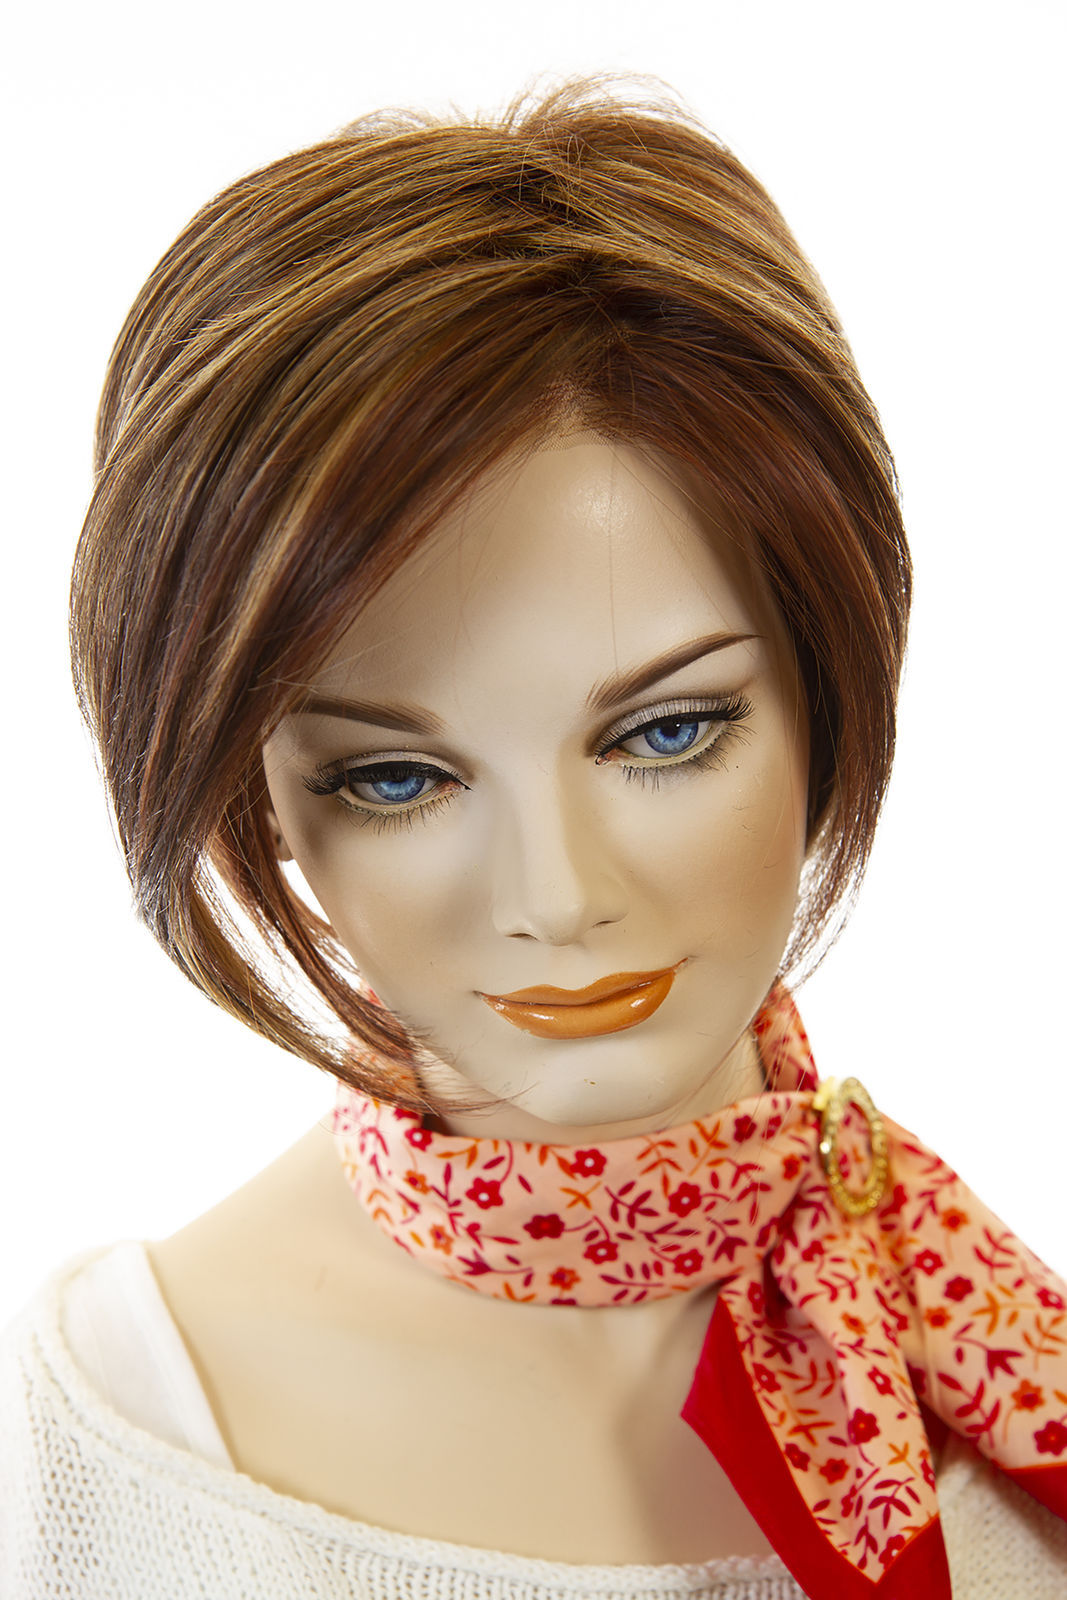 Ignite 32F Medium Short Lace Front Heat Friendly Jon Renau Wavy Curly Wigs - $177.72